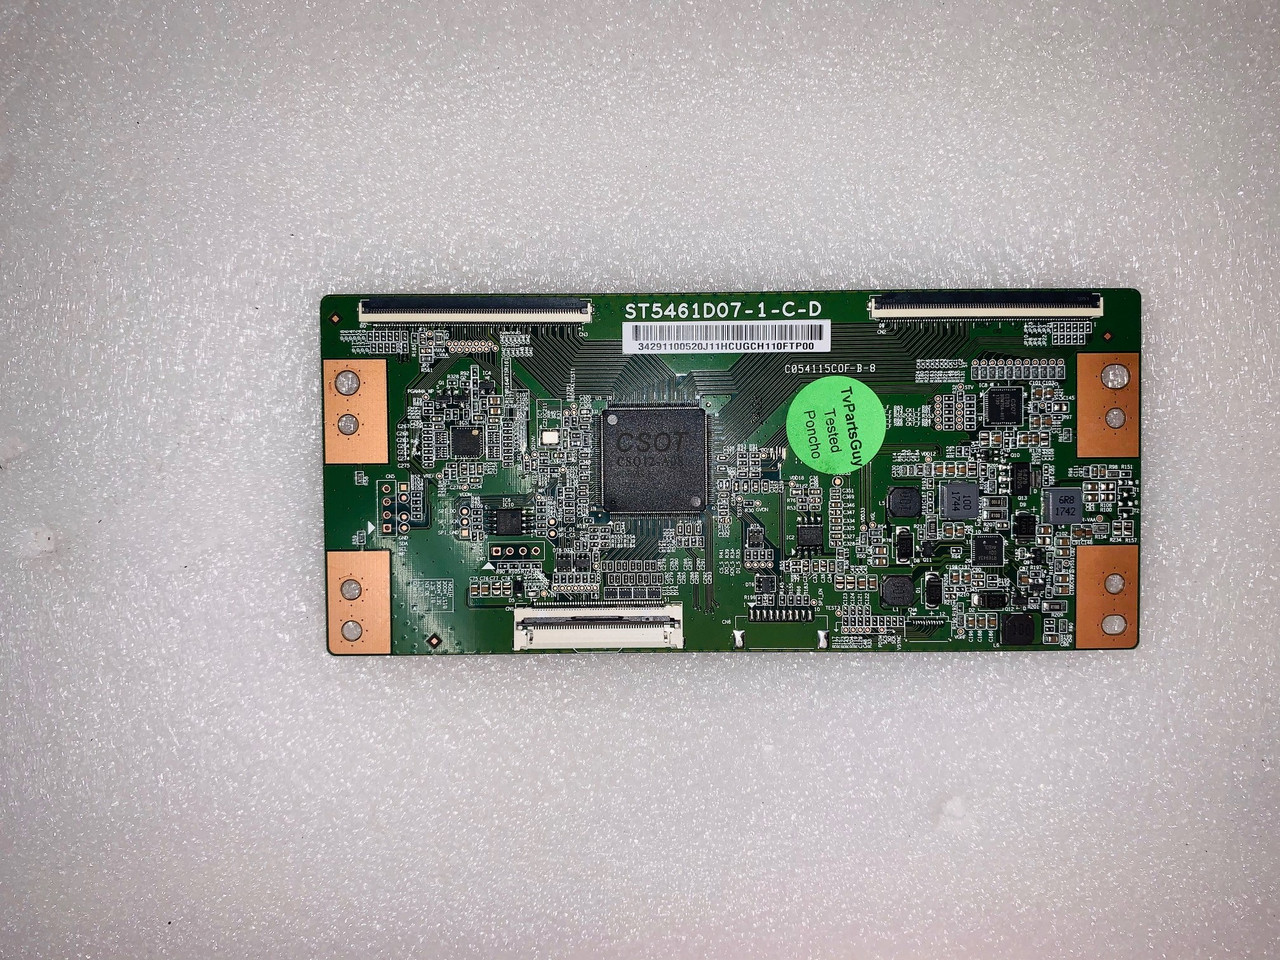 Westinghouse WG55UX4100 Tcon board ST5461D07-1-C-D / 3429110052